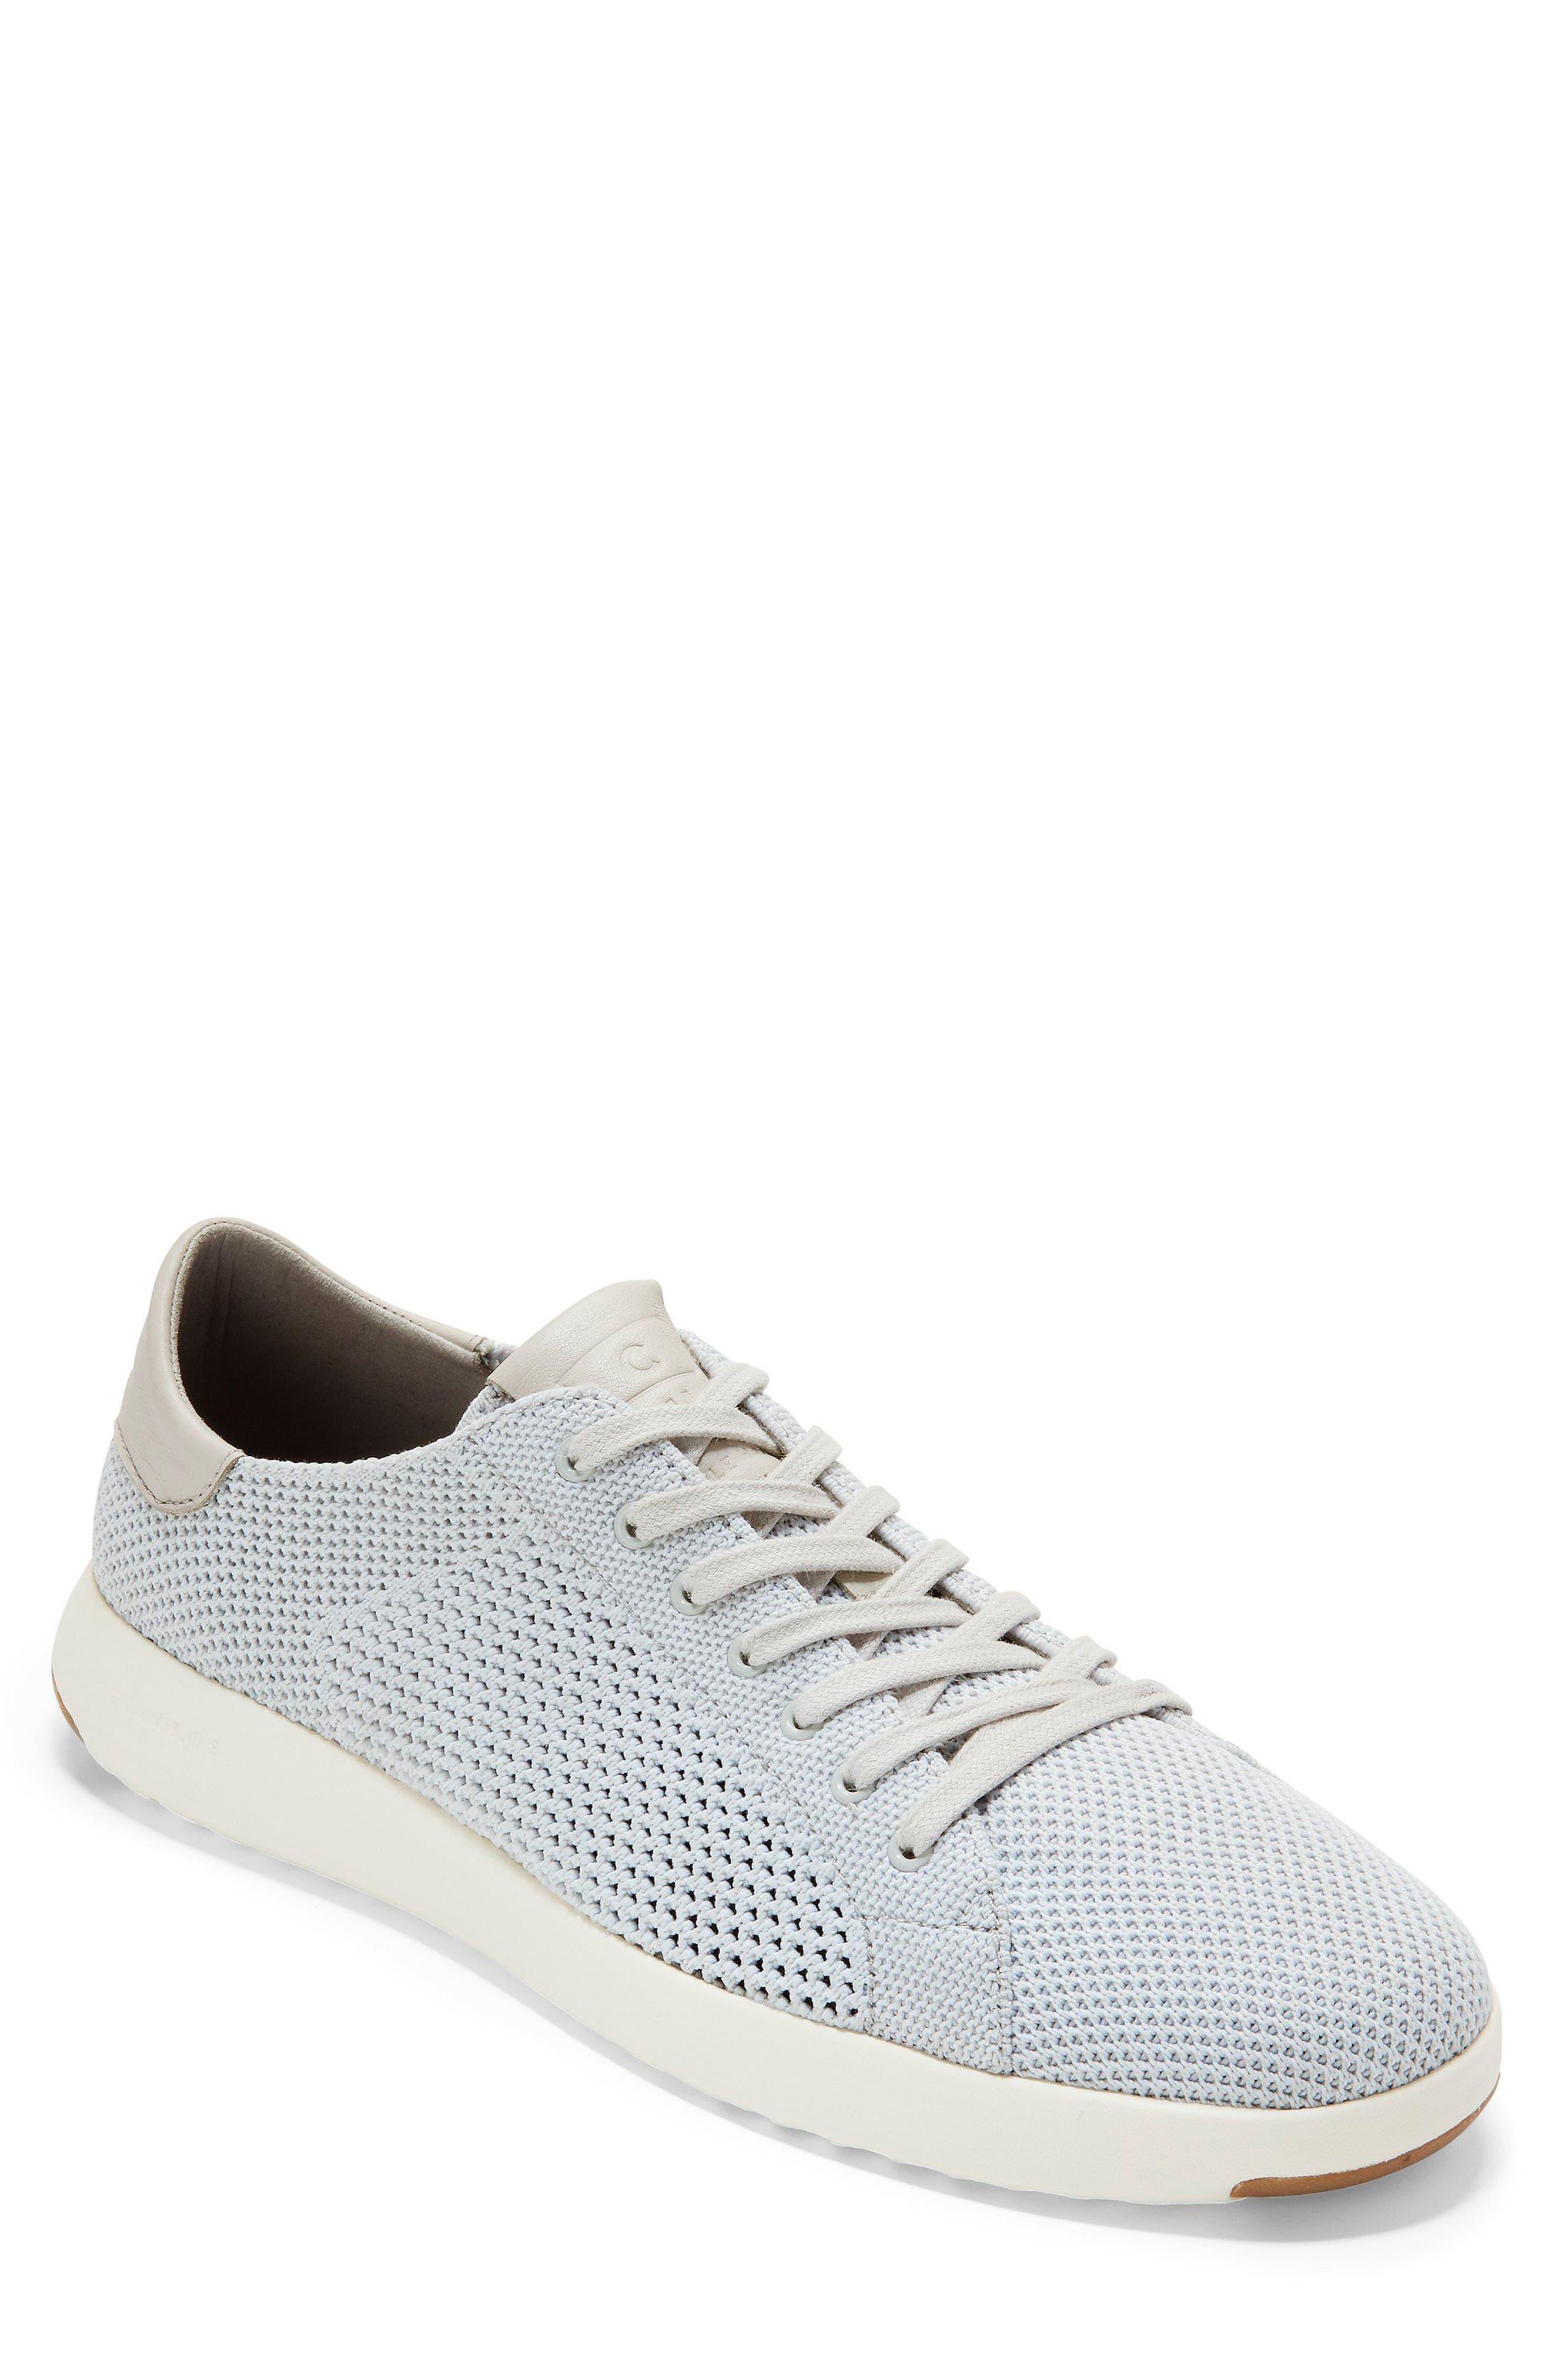 GrandPro Tennis Stitchlite Sneaker,                             Main thumbnail 1, color,                             Vapor Gray/ Optic White